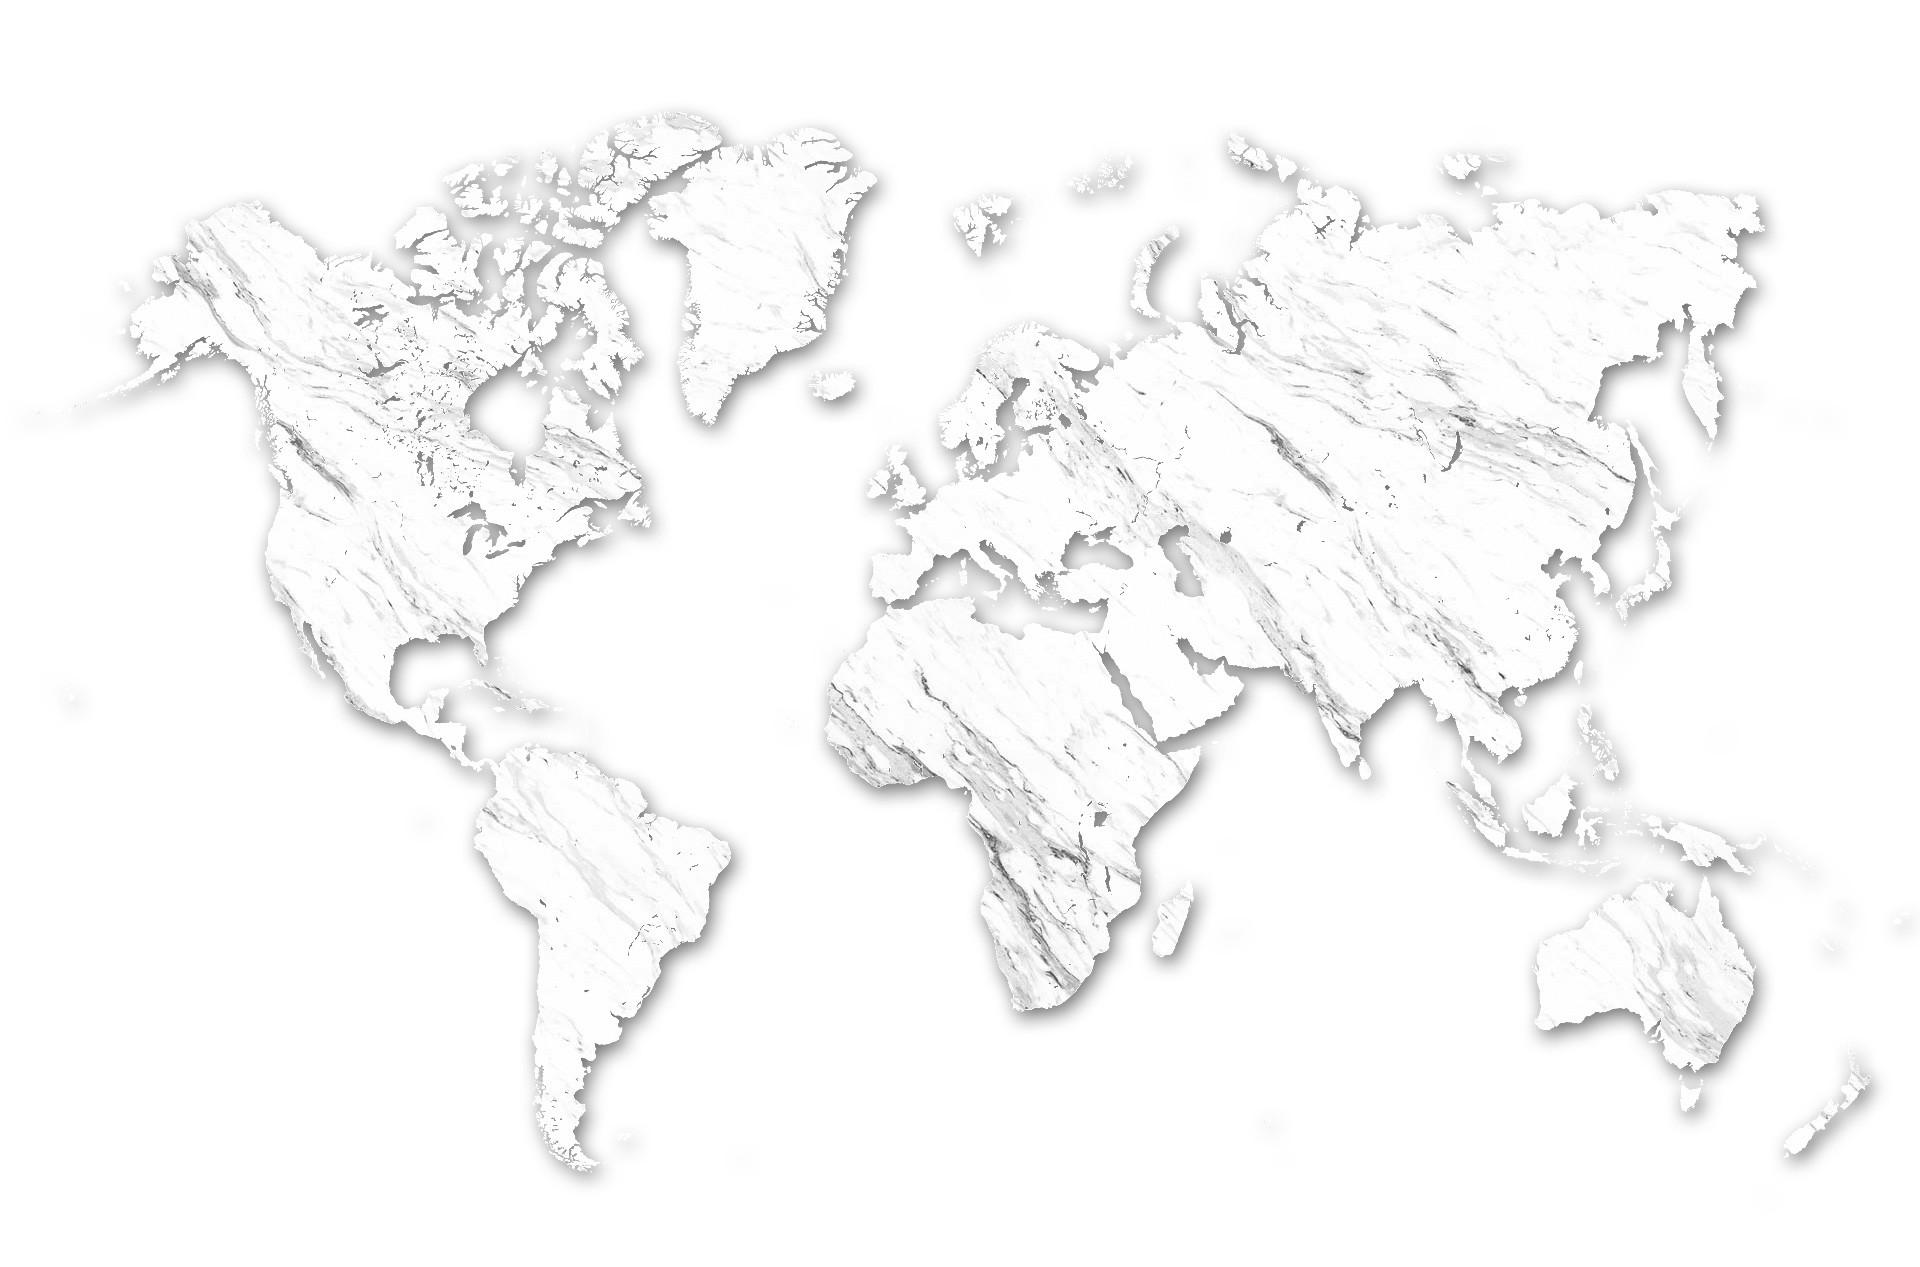 1920x1267 best of world map black and white tumblr havana mooncom